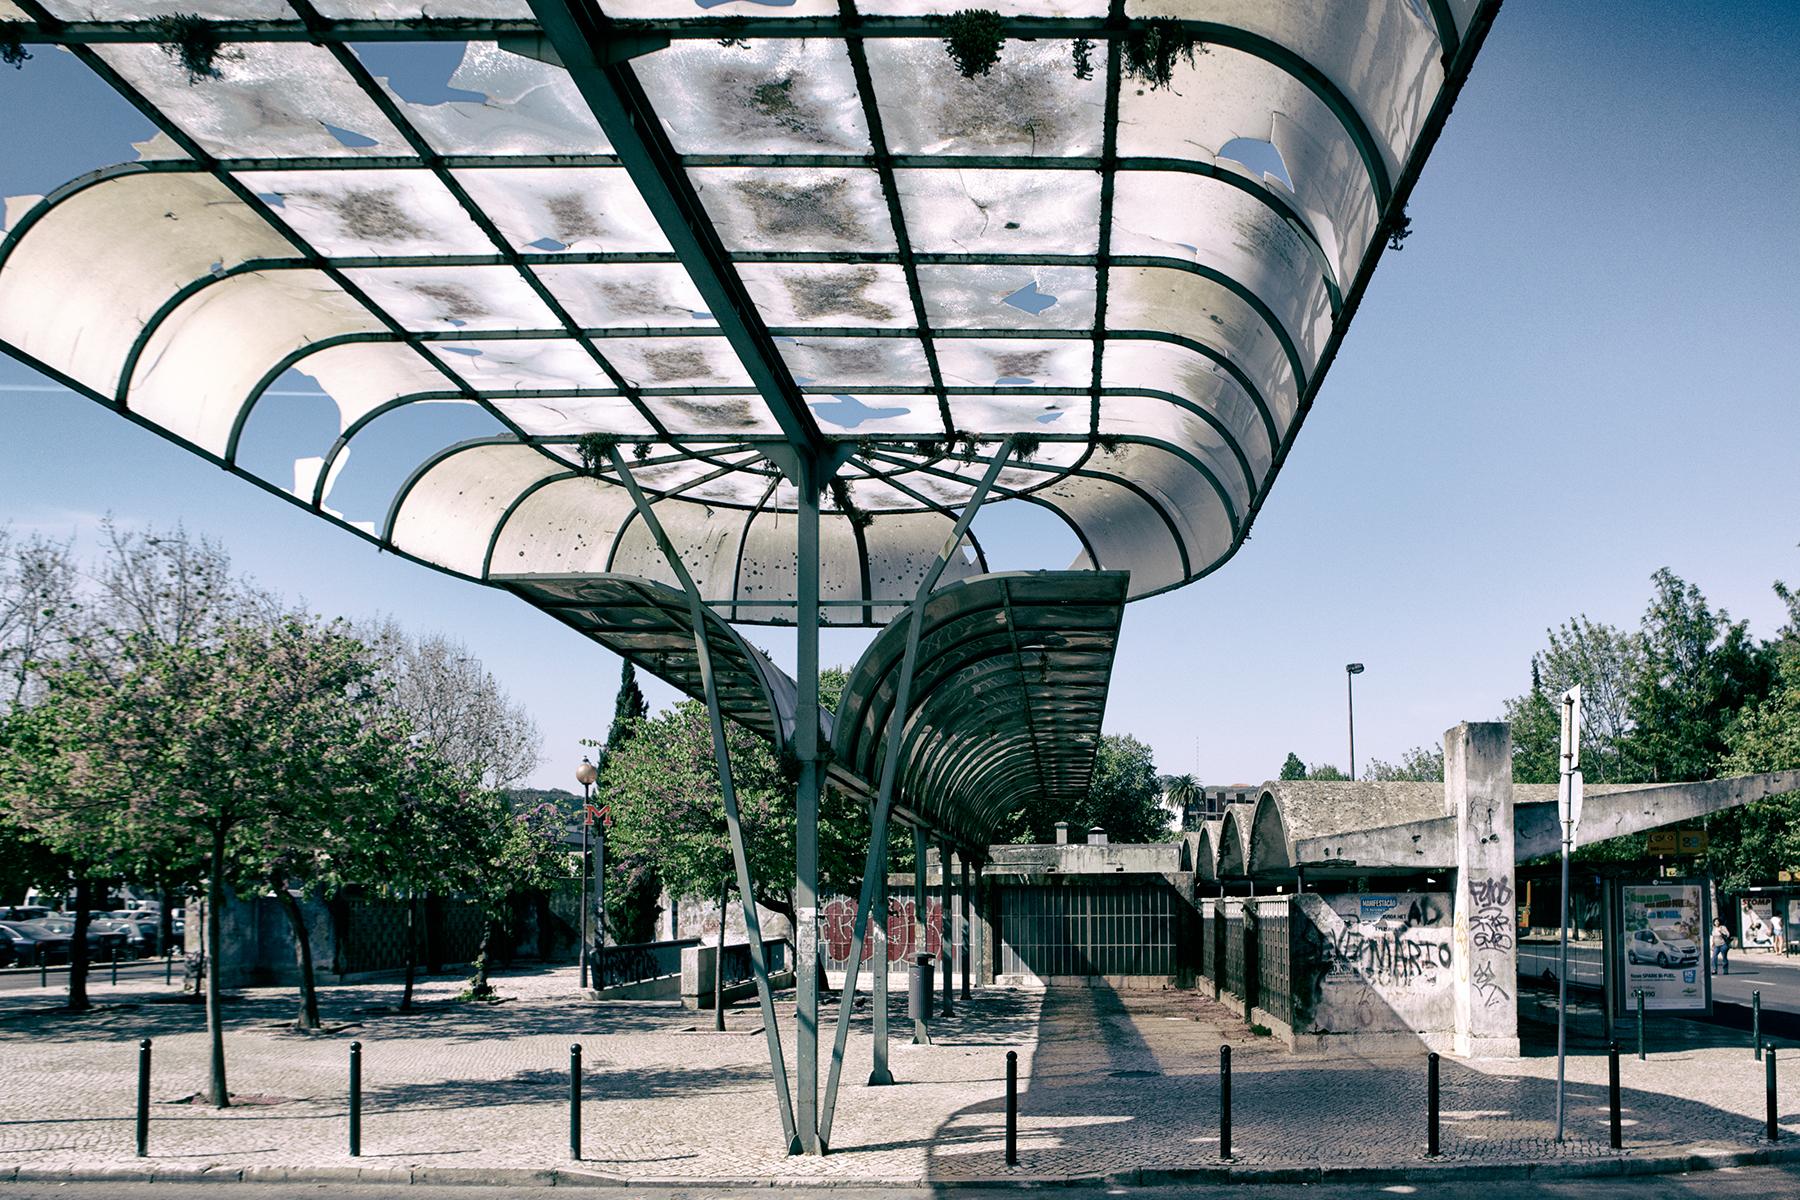 Lisbon Bus Station